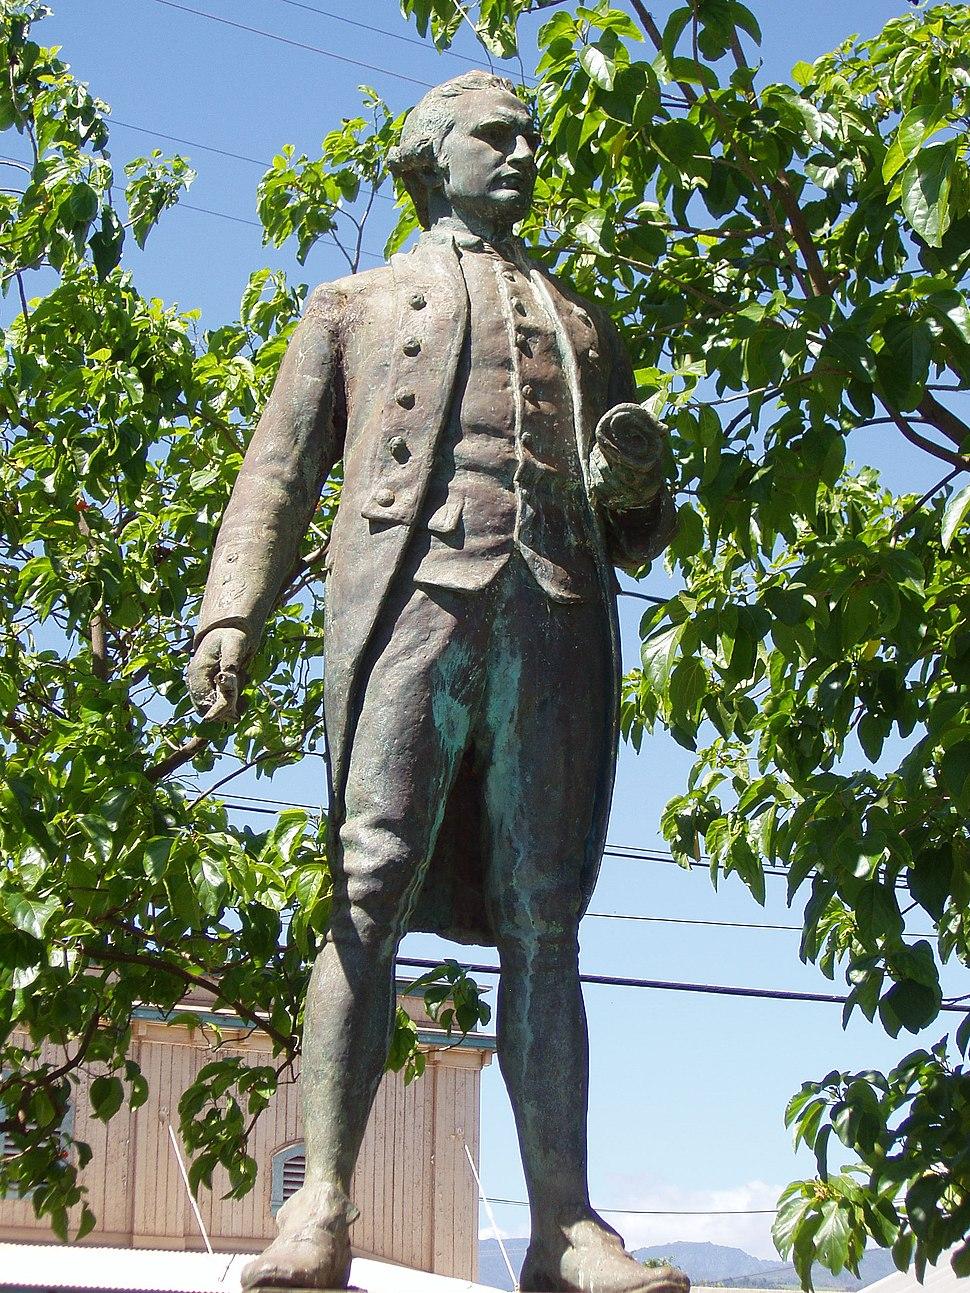 Captain James Cook statue, Waimea, Kauai, Hawaii